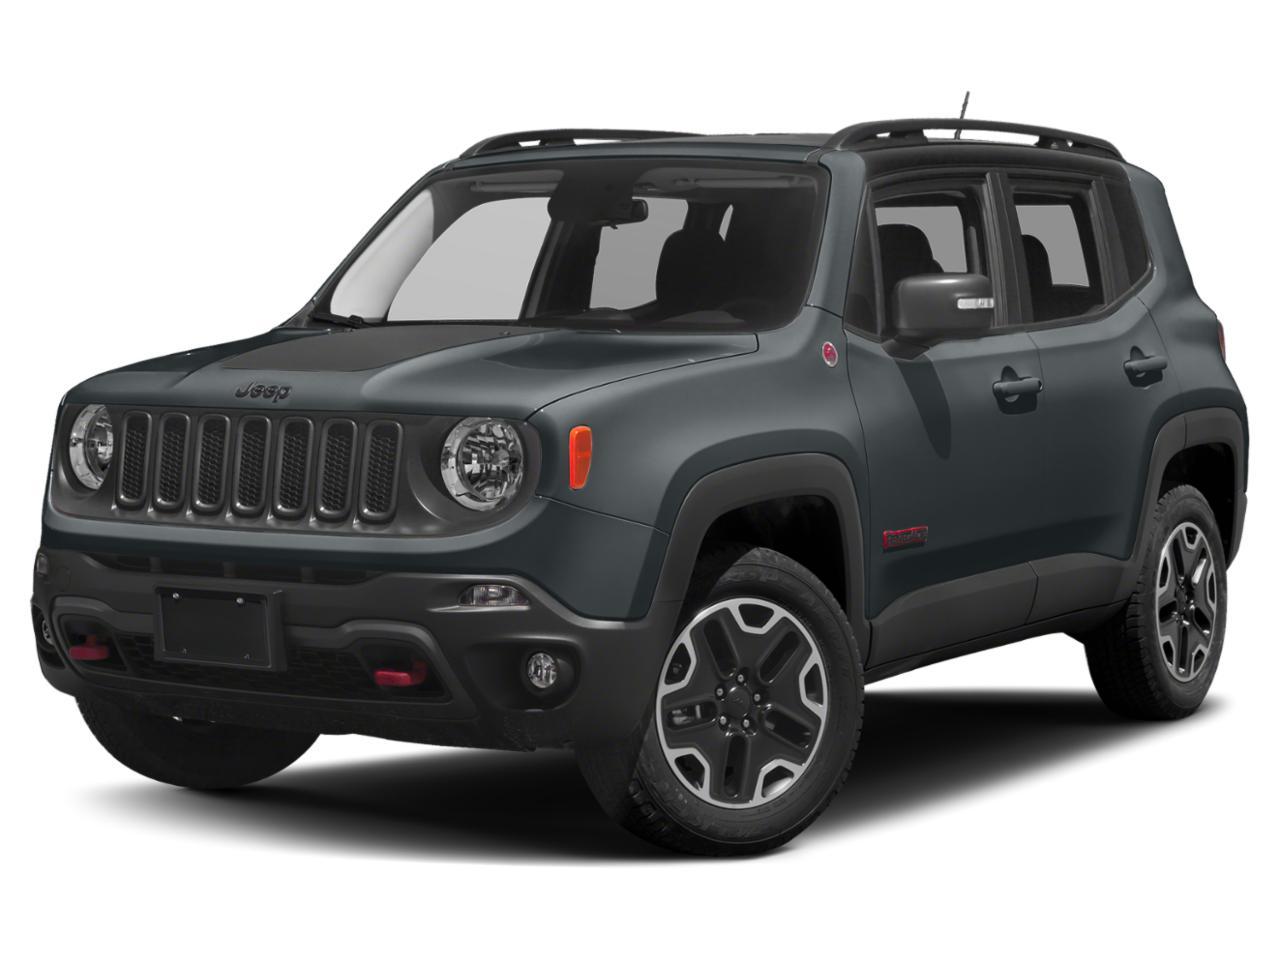 2018 Jeep Renegade Vehicle Photo in Colma, CA 94014